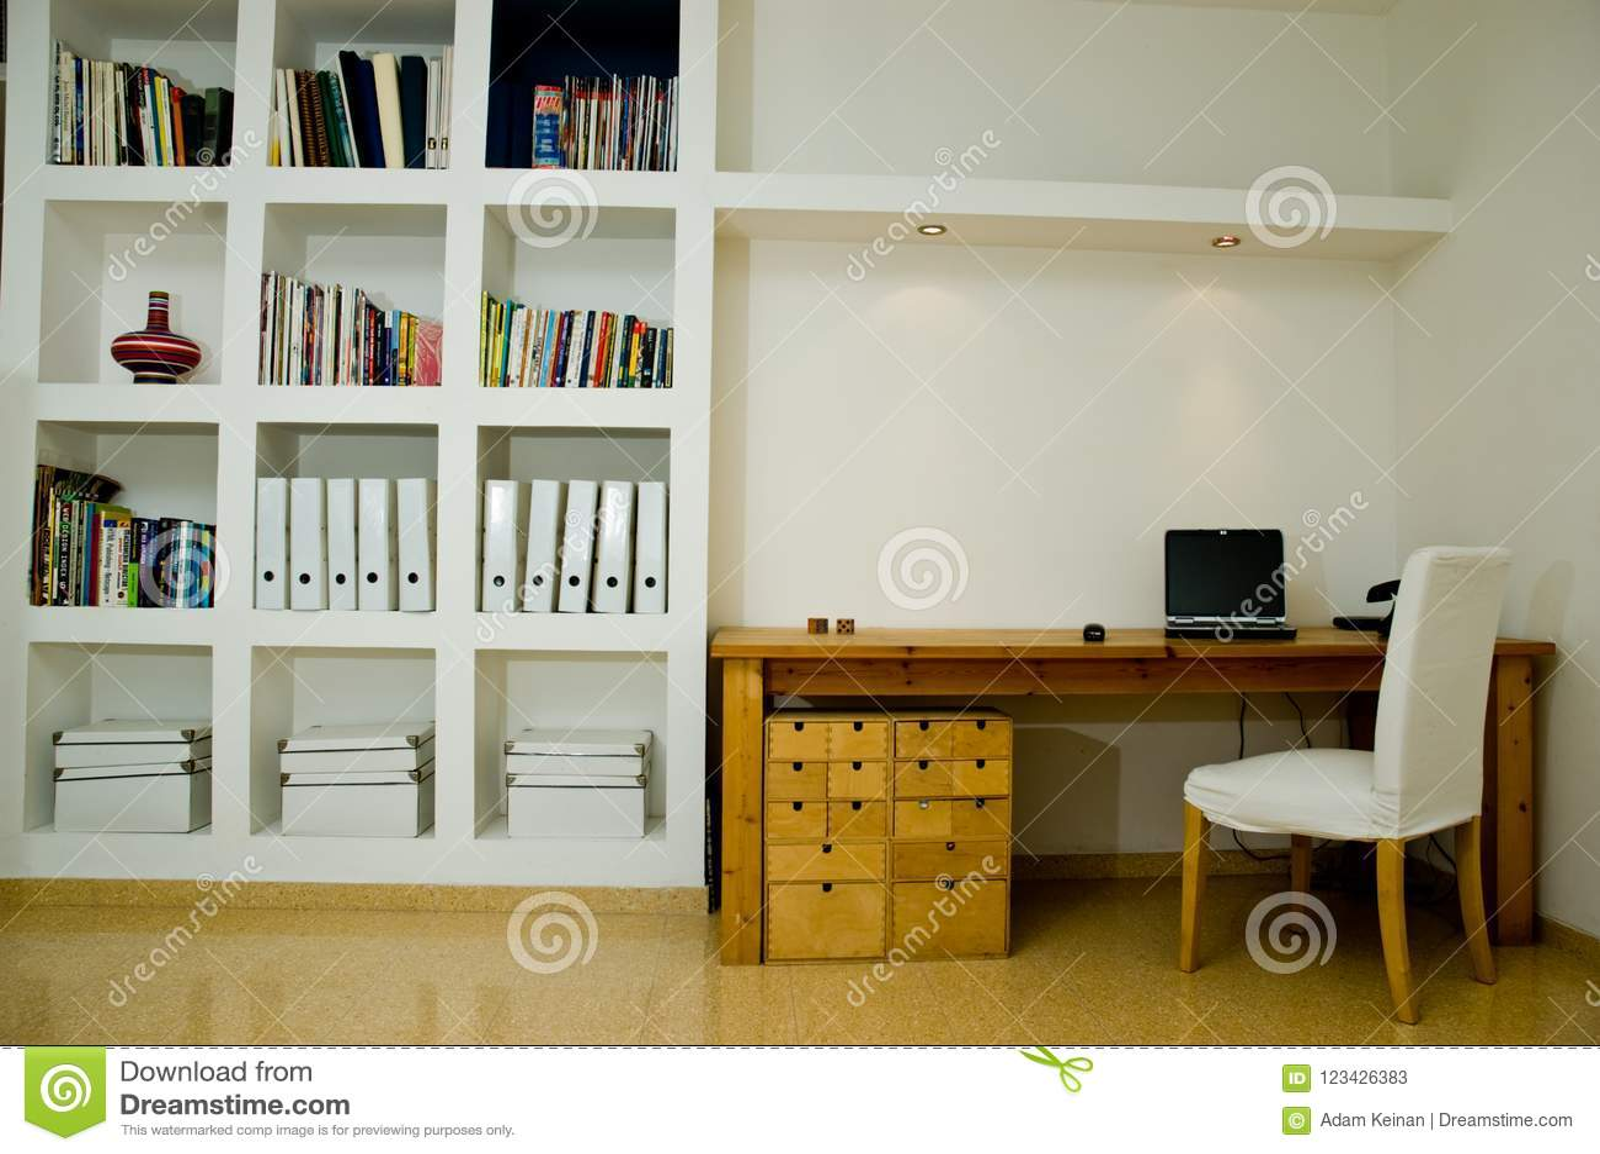 White Living Room Computer And Brown Desk Interior Design Stock Image Image Of Poster Desk 123426383